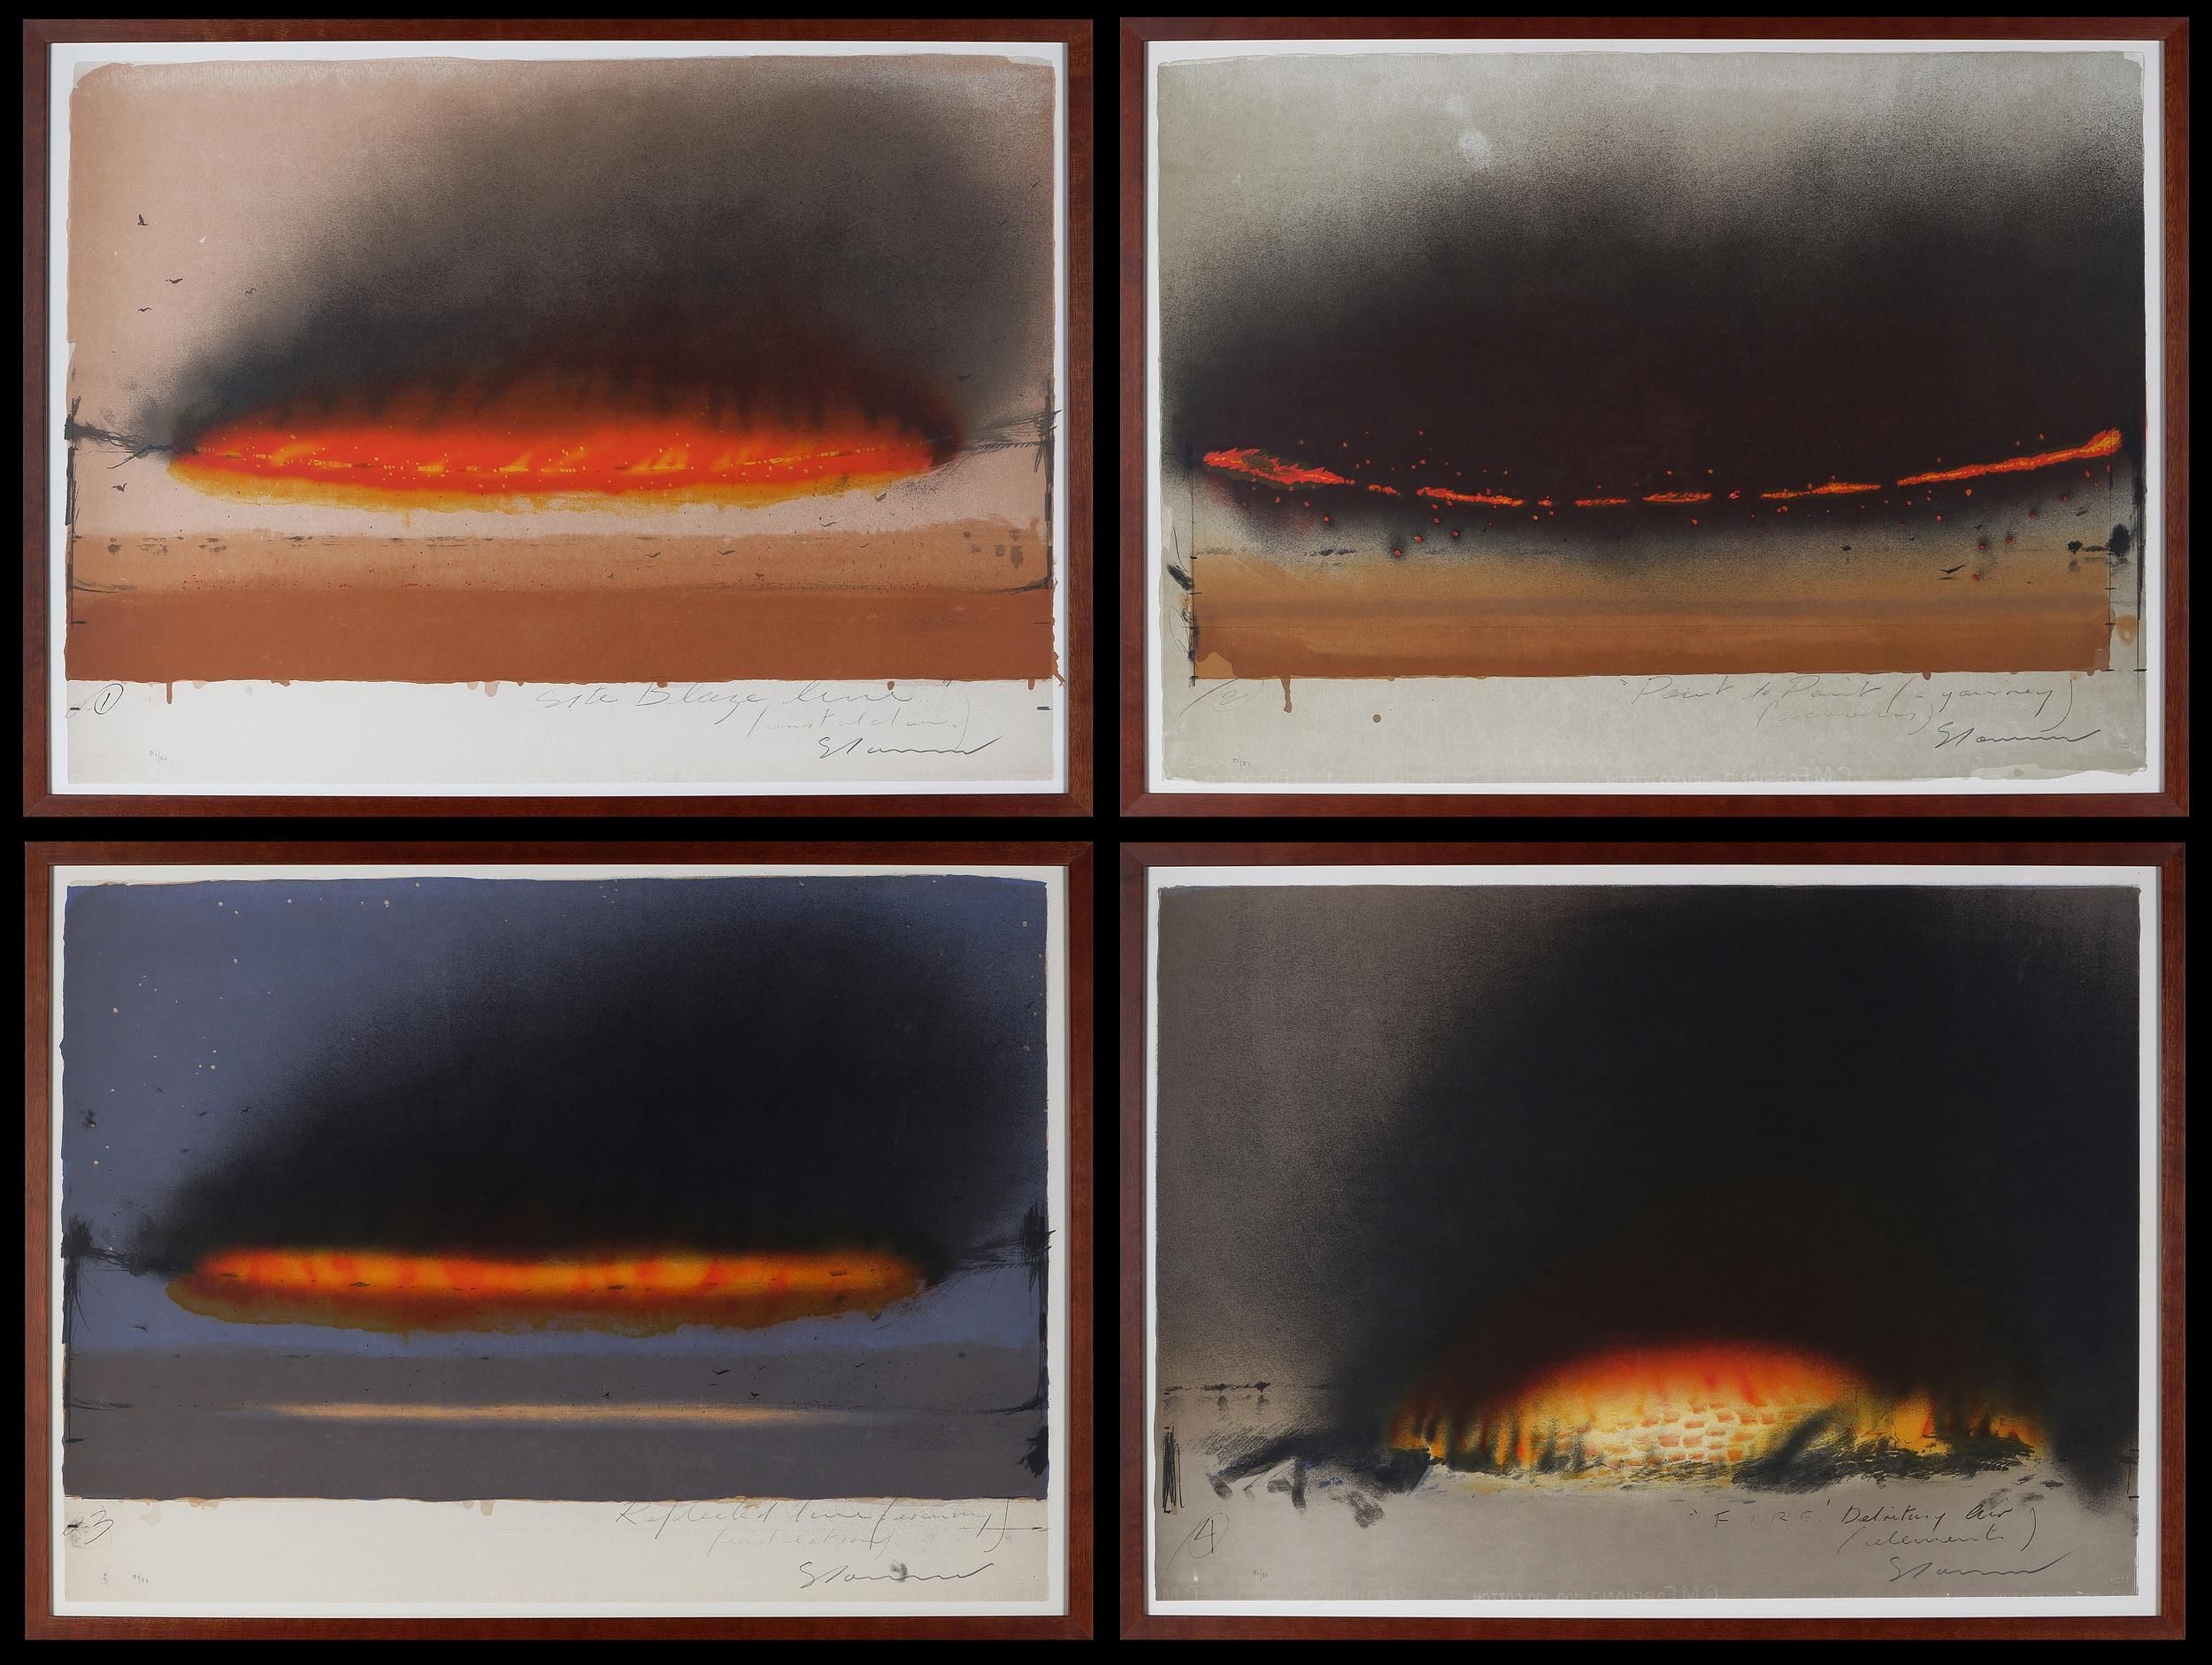 'Tim Storrier (born 1949), Blaze Line Quartet: i) Site Blaze Line (Installation); ii) Point to Point (A Journey/ Across); iii) Reflected Line (Evening) (Installation), iv) Fire (Elements), Lithograph'